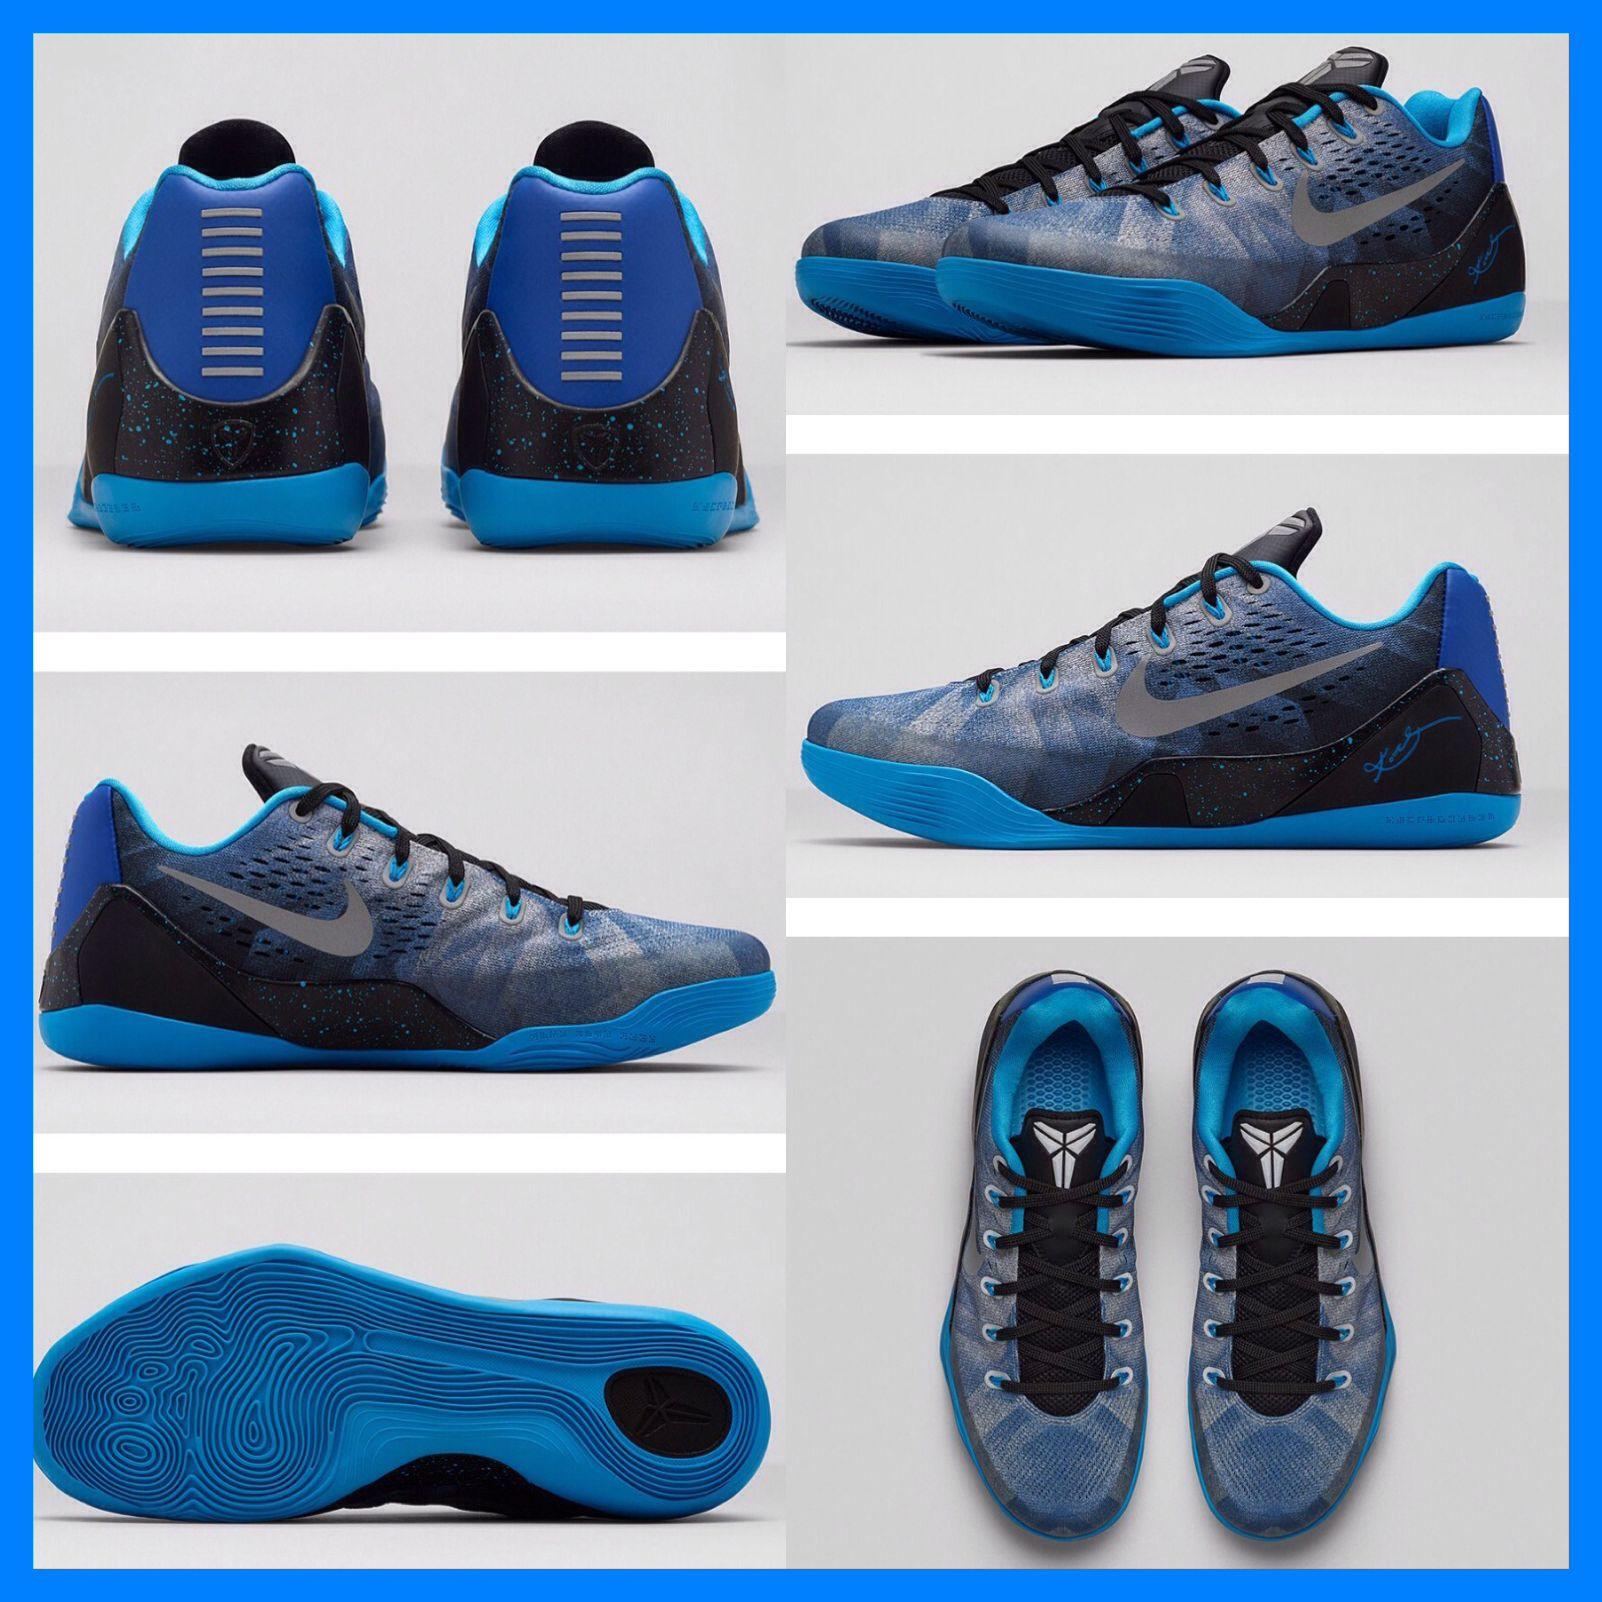 purchase cheap d77e8 e3cca Kobe 9 Premium 652908-606 Gym Red Metallic Silver-Bright Crimson  170   Amazing  Nike  Kobe9  PremiumCollection   My Secret Affair   Sneakers,  Street wear, ...